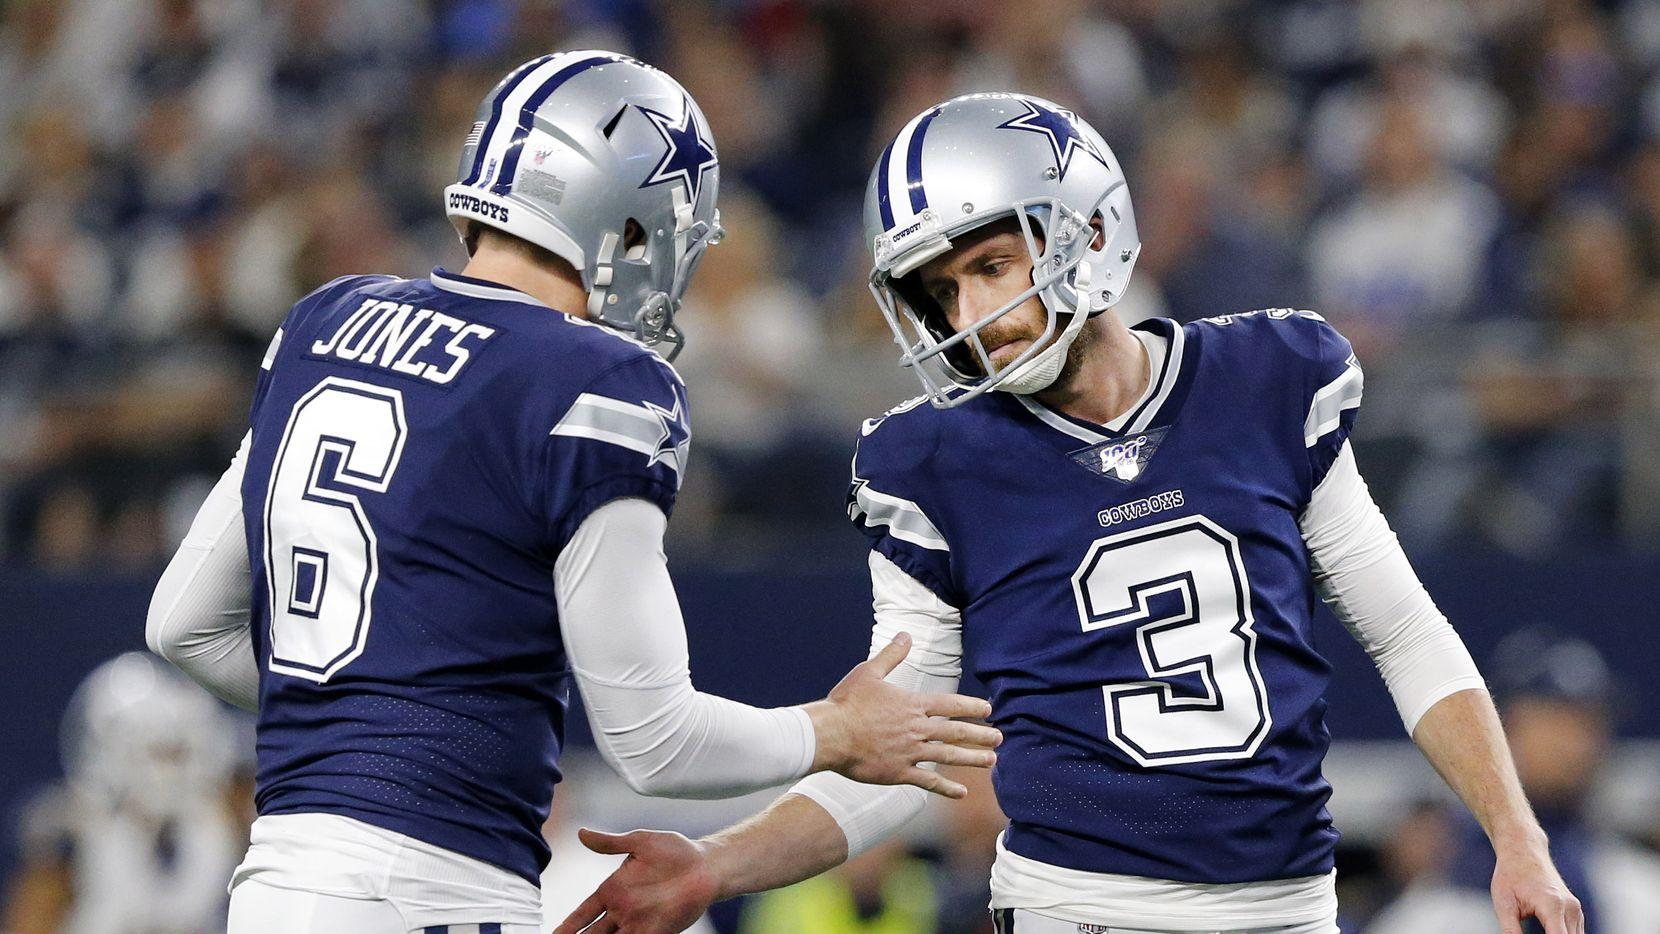 Dallas Cowboys holder Chris Jones (6) congratulates new kicker Kai Forbath (3) on his second half field goal against the Los Angeles Rams at AT&T Stadium in Arlington, Texas, Sunday, December 15, 2019.